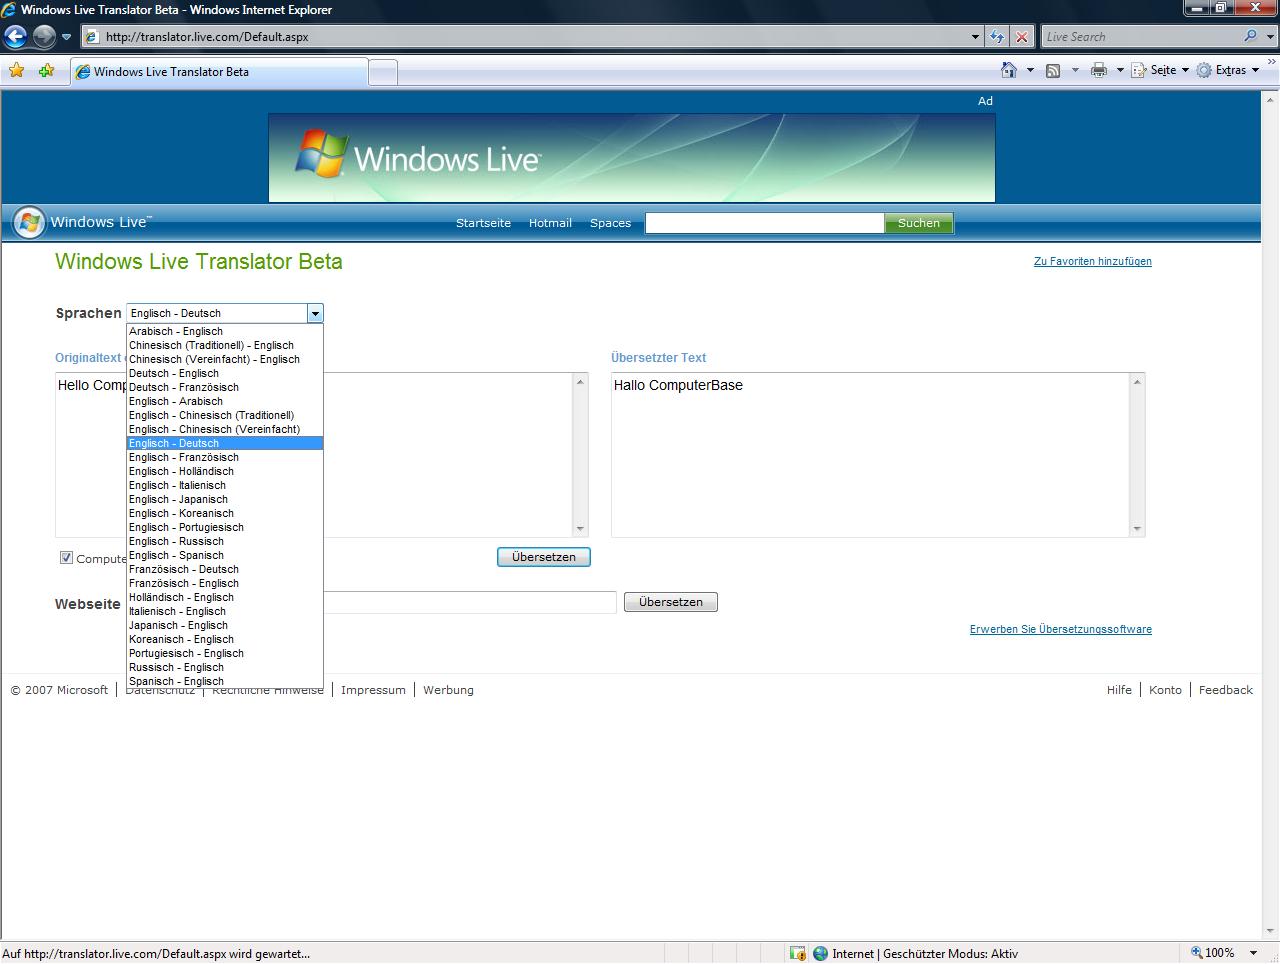 Windows Live Translator verfügbare Sprachen